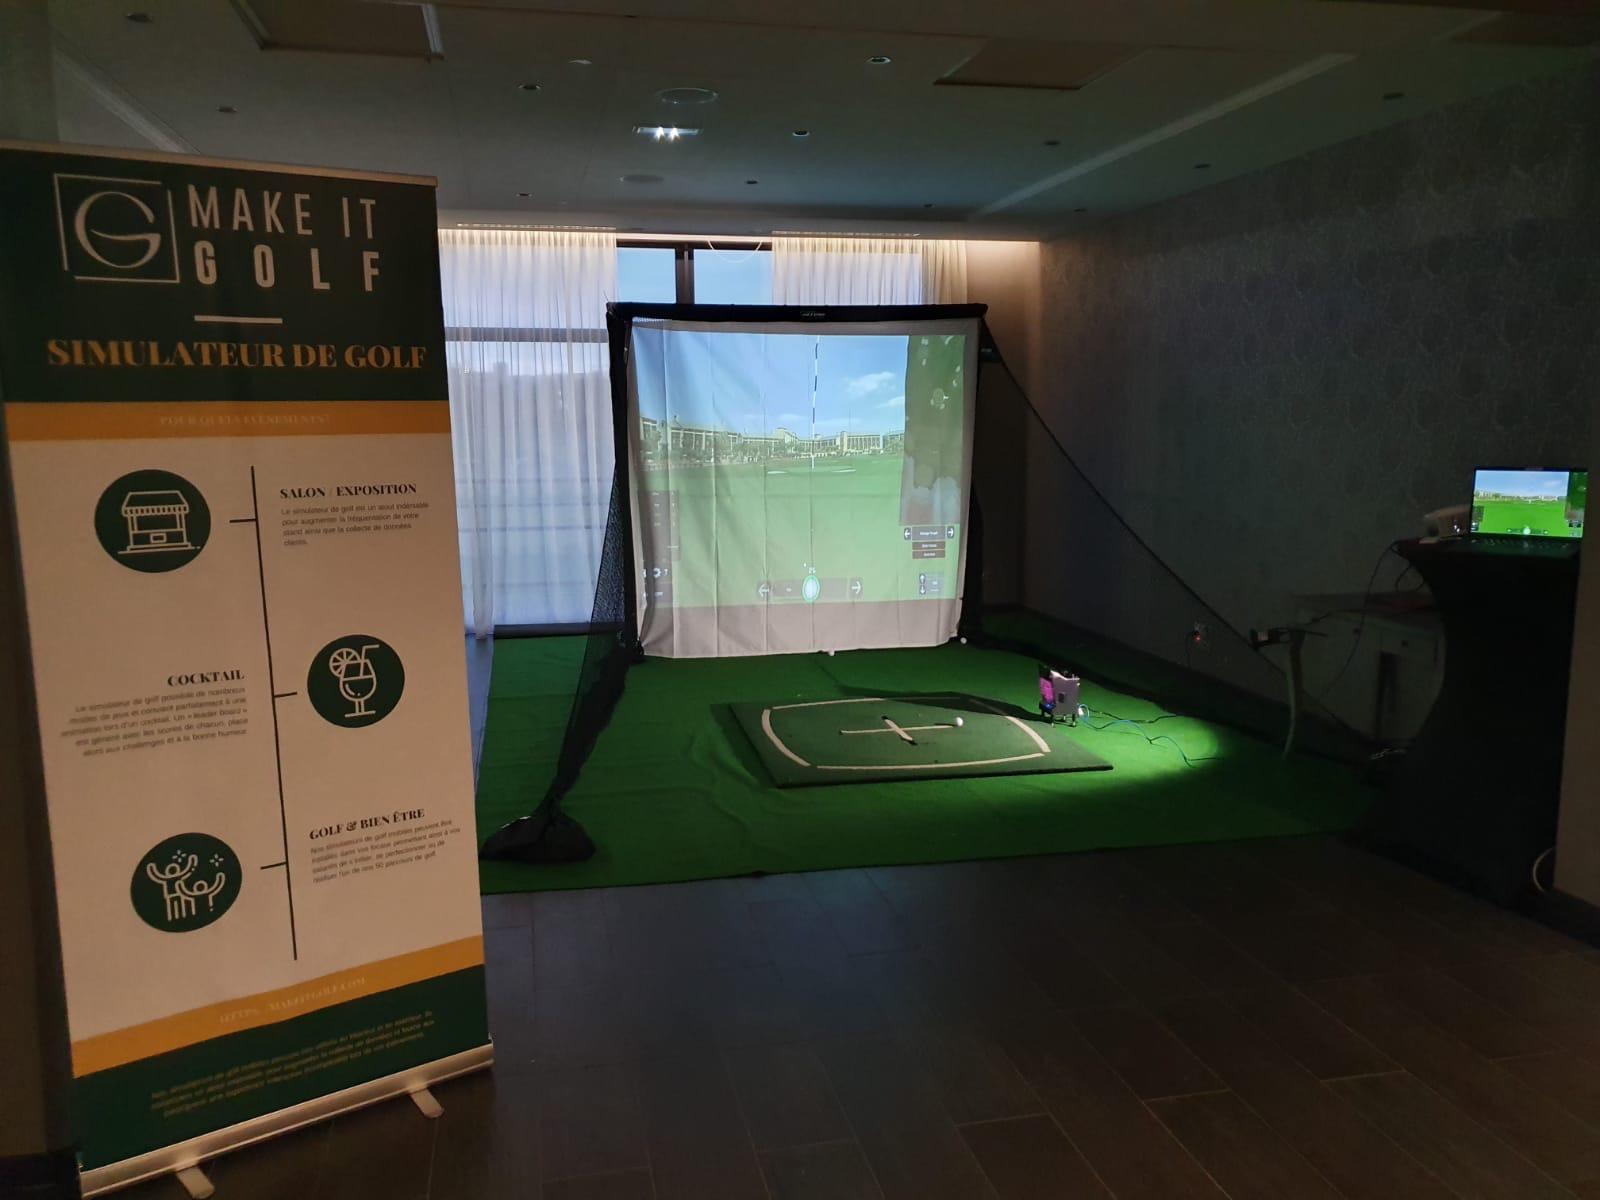 Golf simulateur